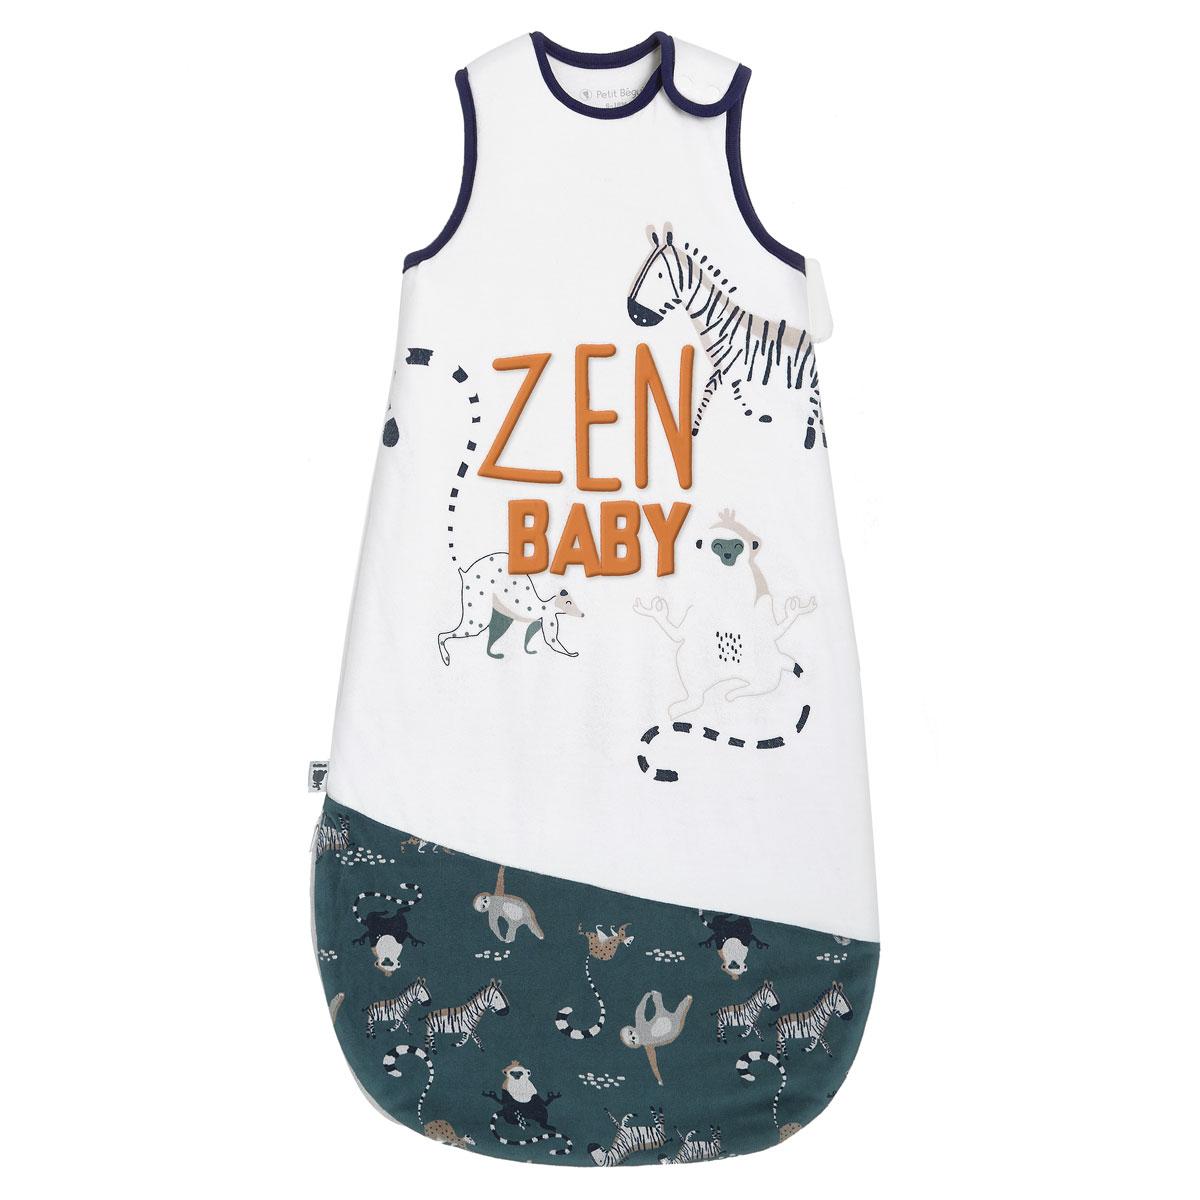 Gigoteuse d'hiver en velours Baby Zen